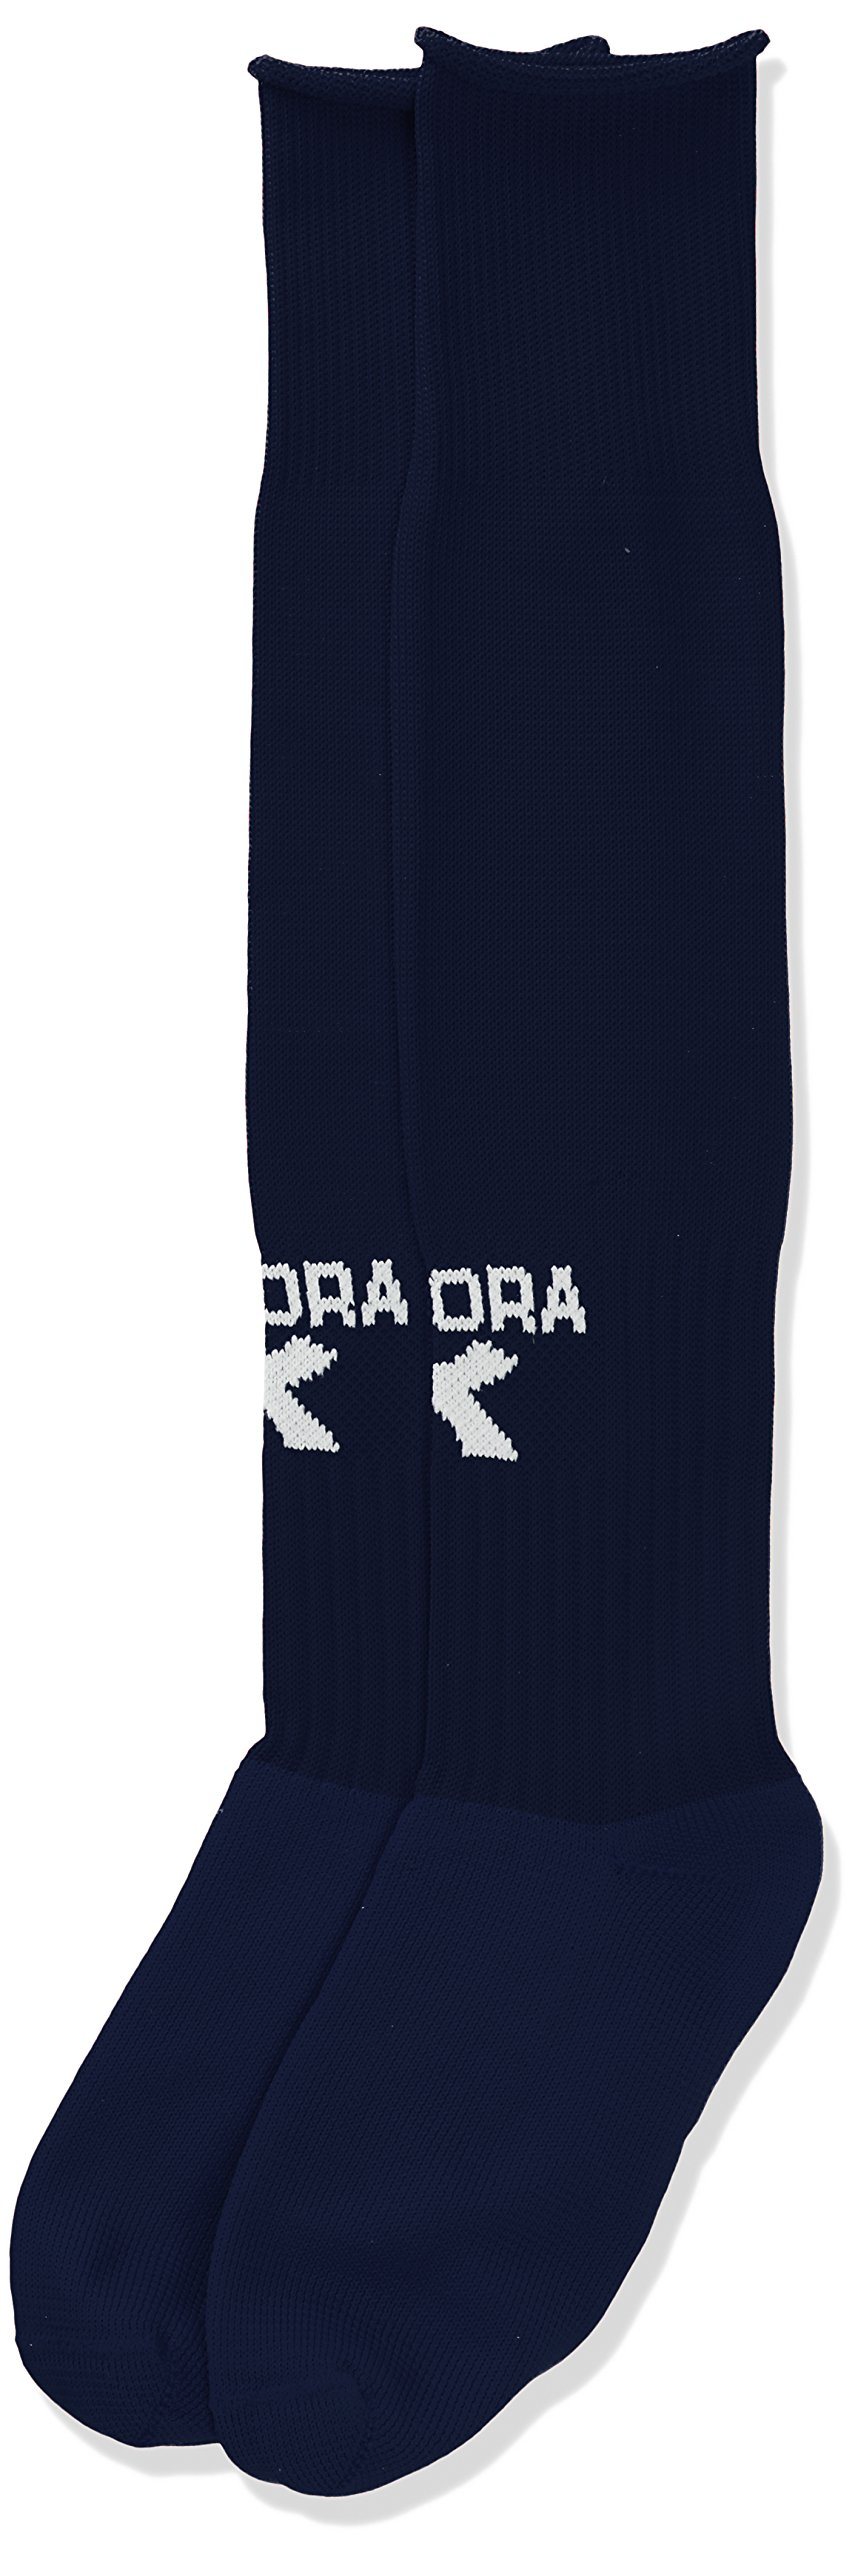 Diadora Squadra Soccer Socks, Small, Navy by Diadora